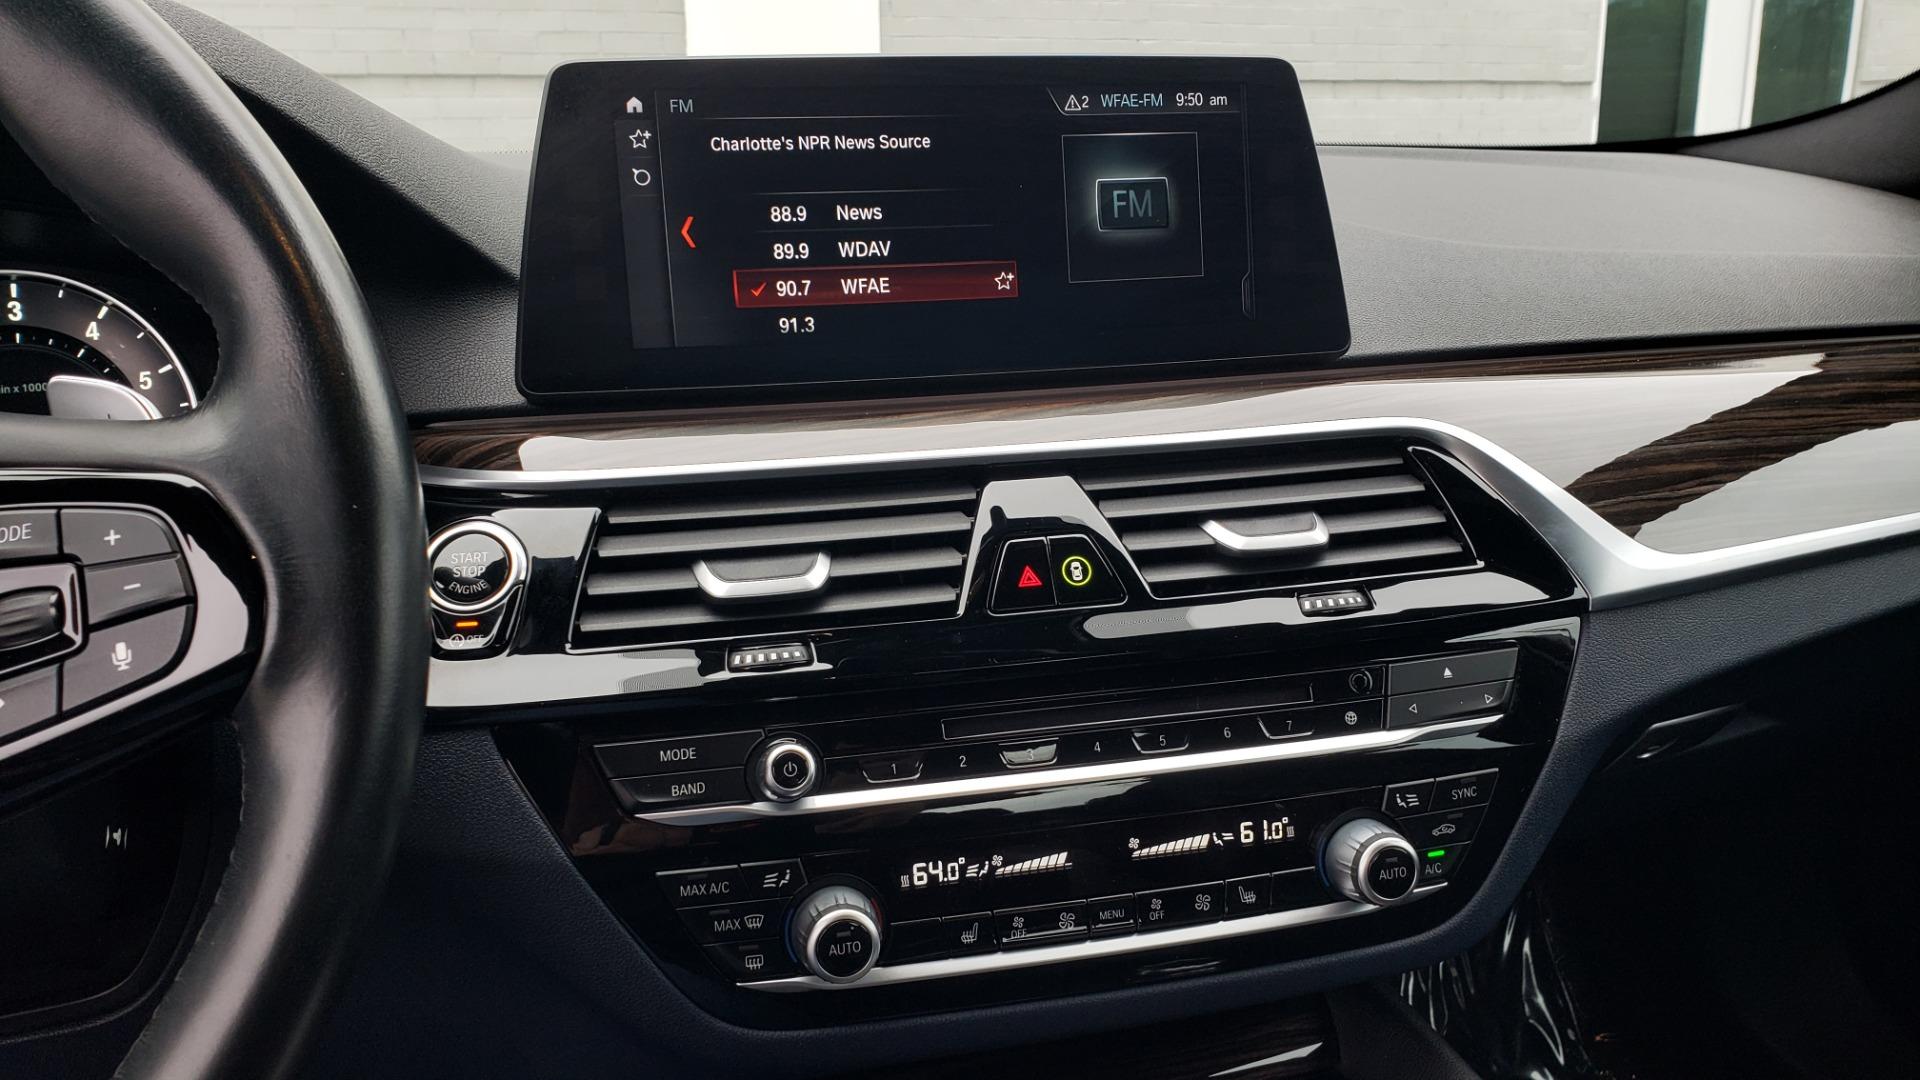 Used 2017 BMW 5 SERIES 530IXDRIVE / PREM PKG / DRVR ASST PLUS / CLD WTHR / APPLE CARPLAY for sale $30,595 at Formula Imports in Charlotte NC 28227 44